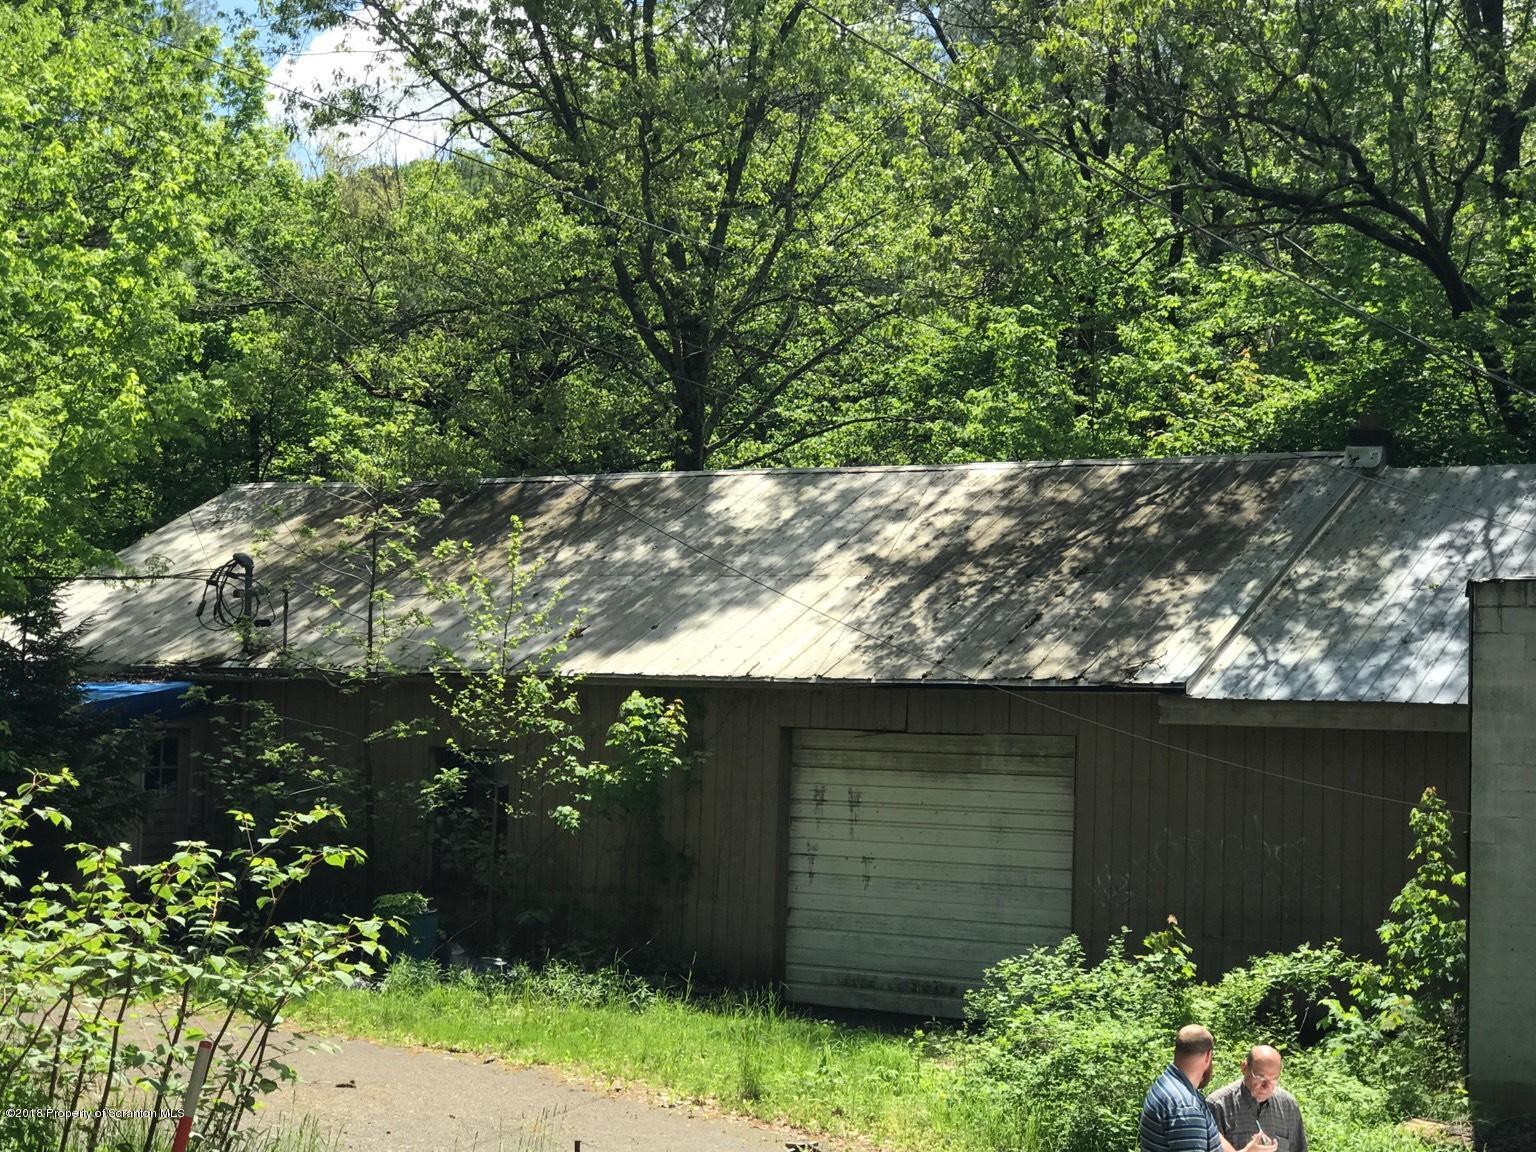 166 Buttermilk Rd, Falls, Pennsylvania 18615, ,Commercial,For Sale,Buttermilk,18-2399